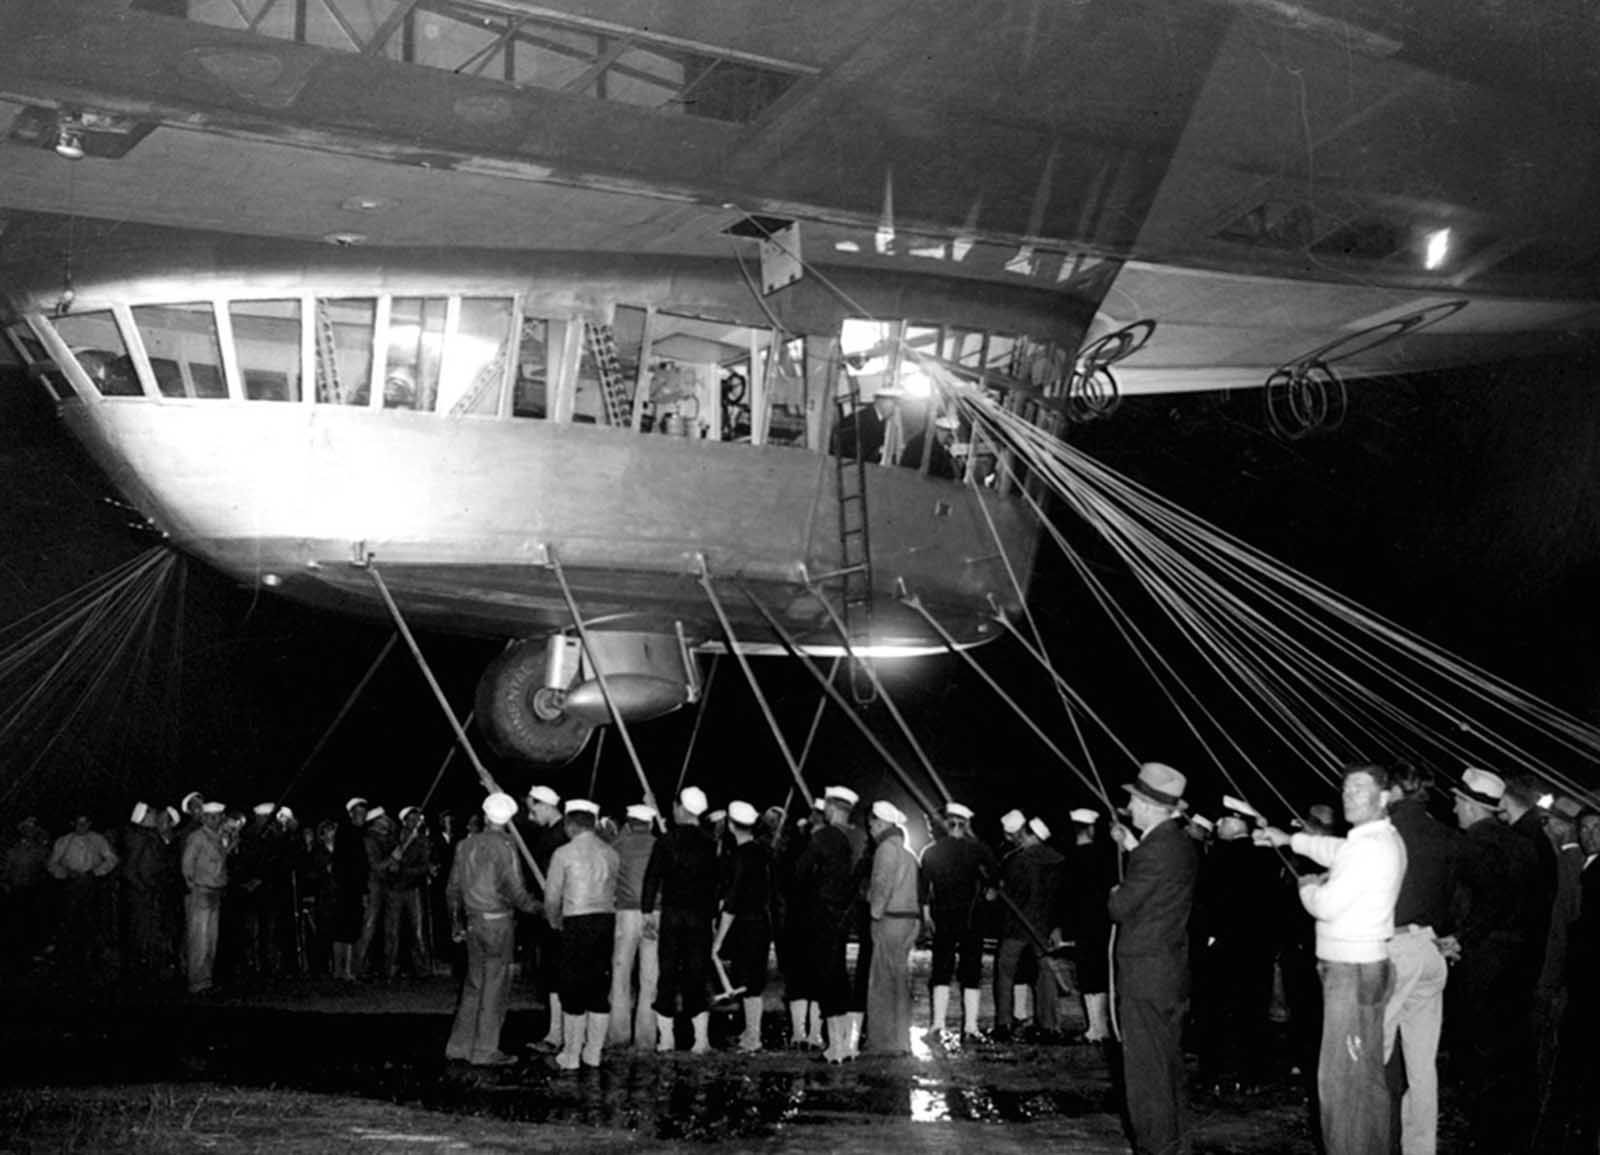 The Hindenburg Disaster in pictures, 1937 Zeppelin